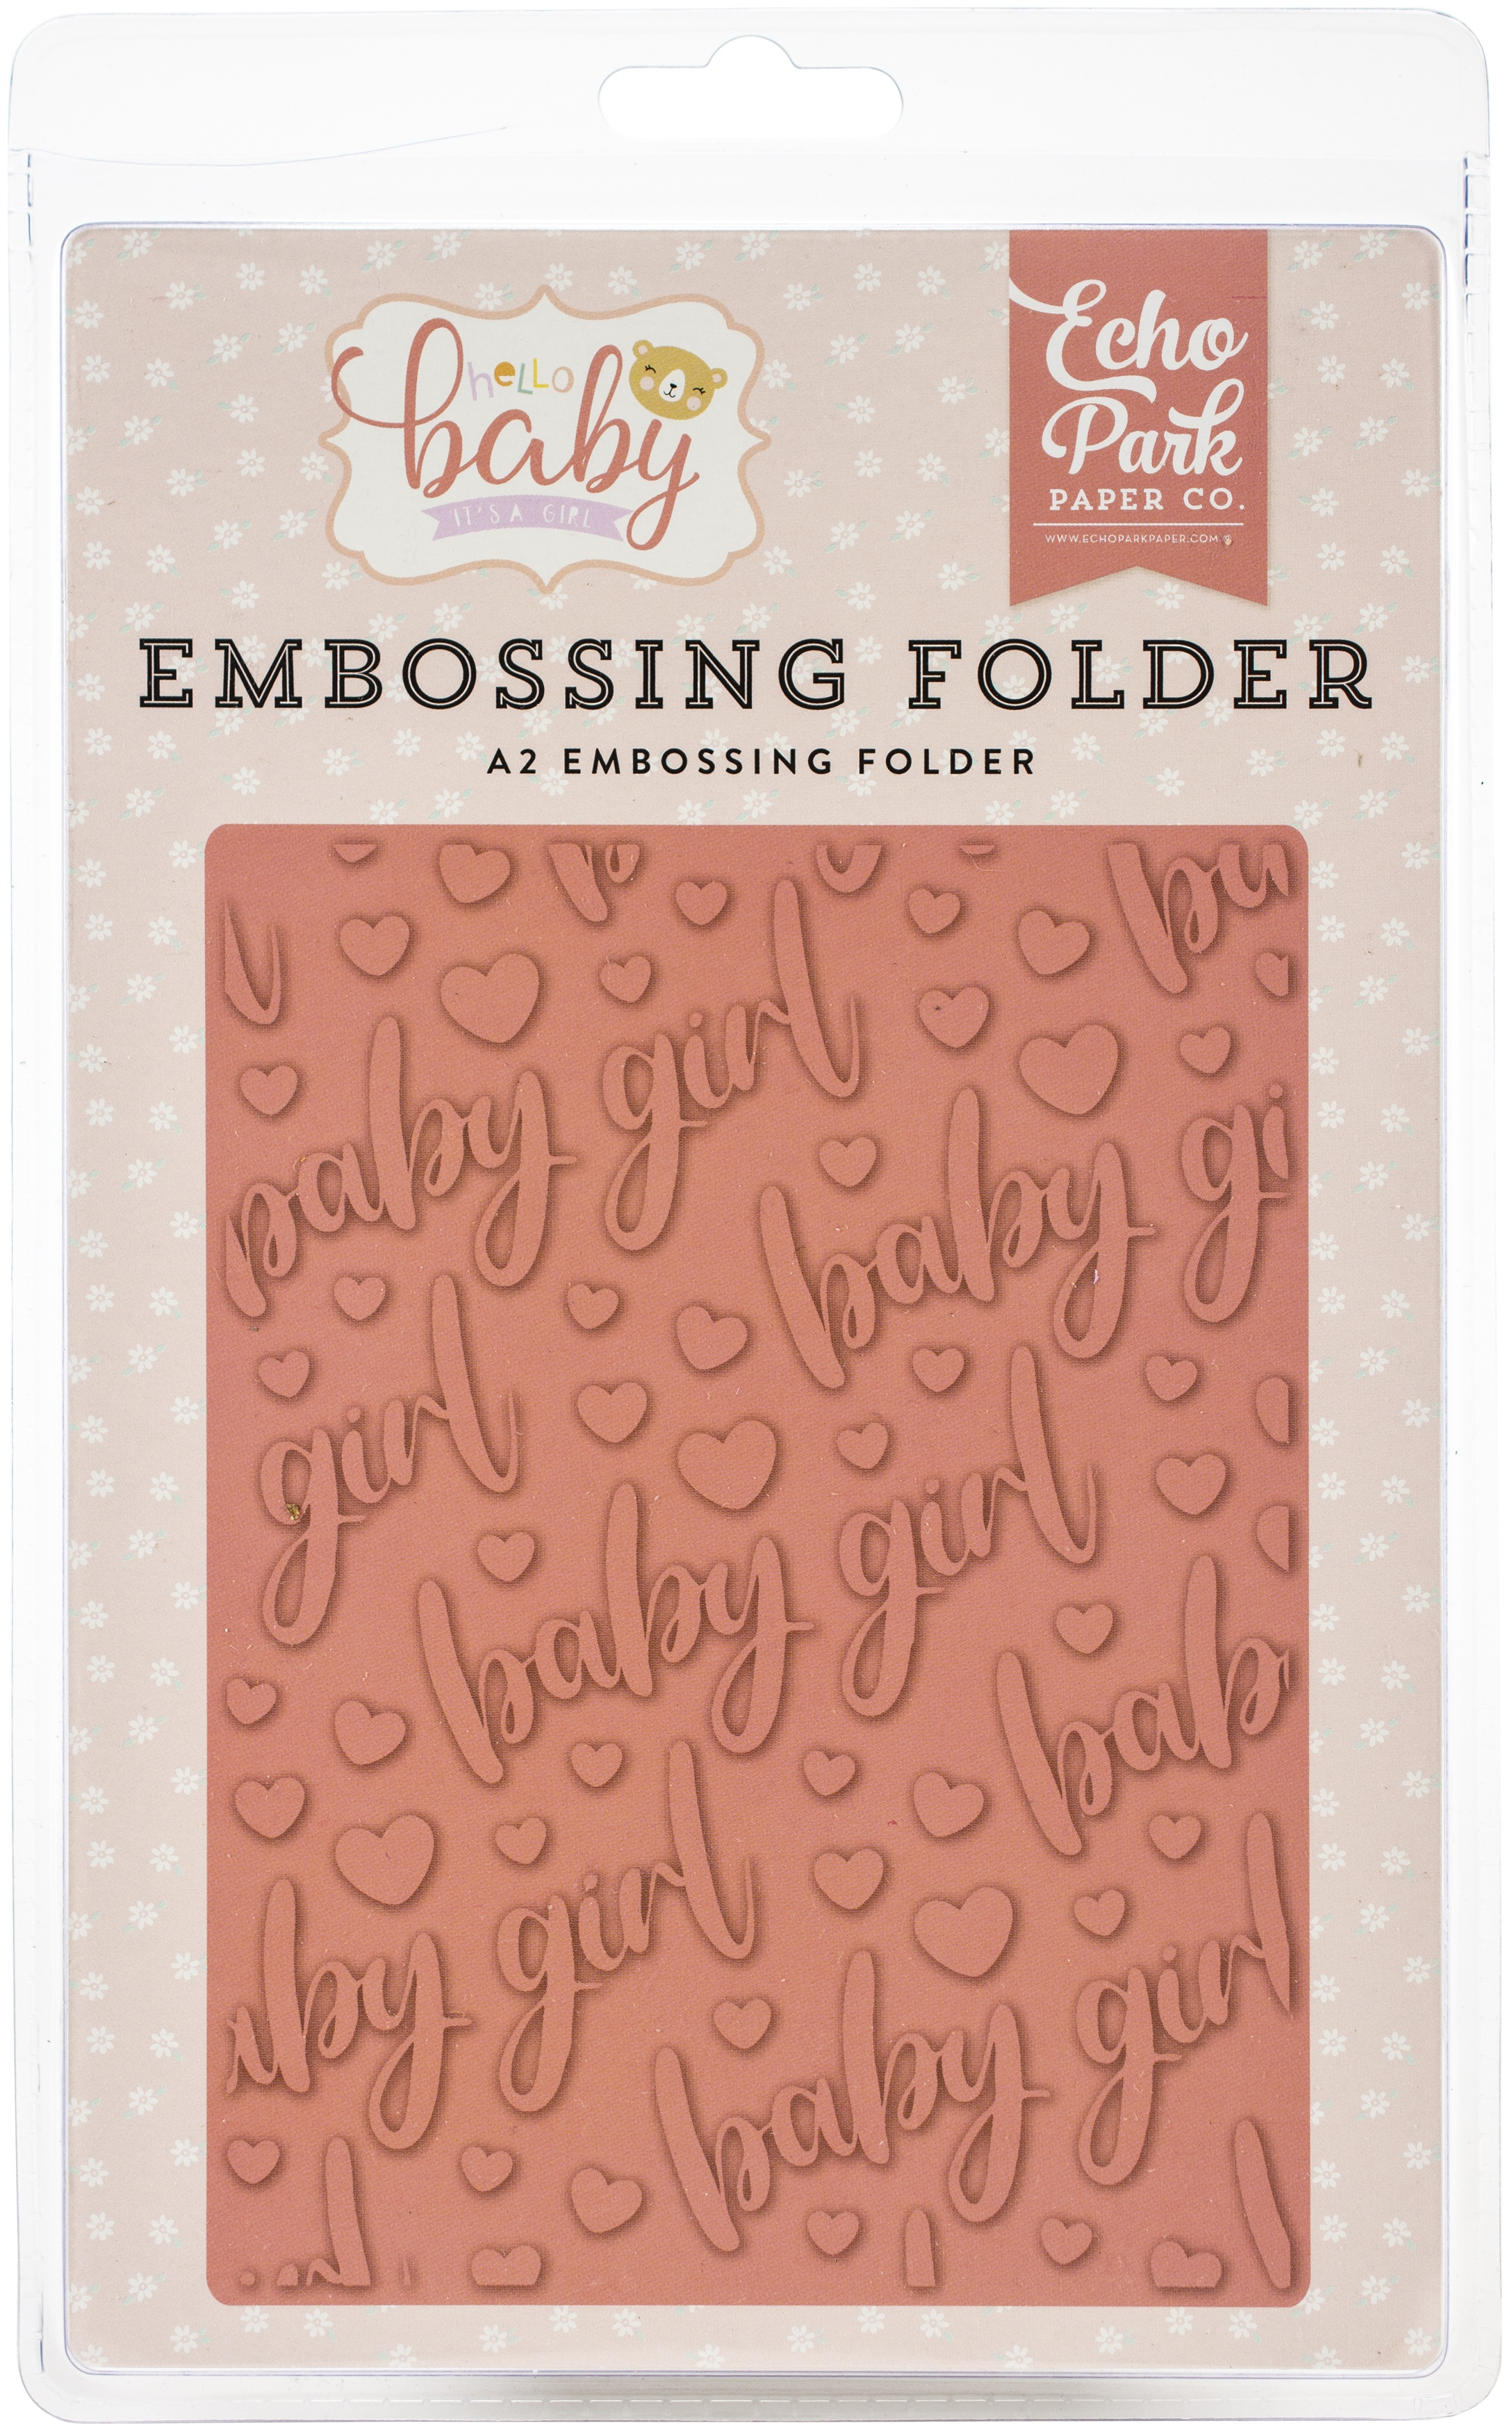 EMBOSSING FOLDER - HELLO BABY IT'S A GIRL